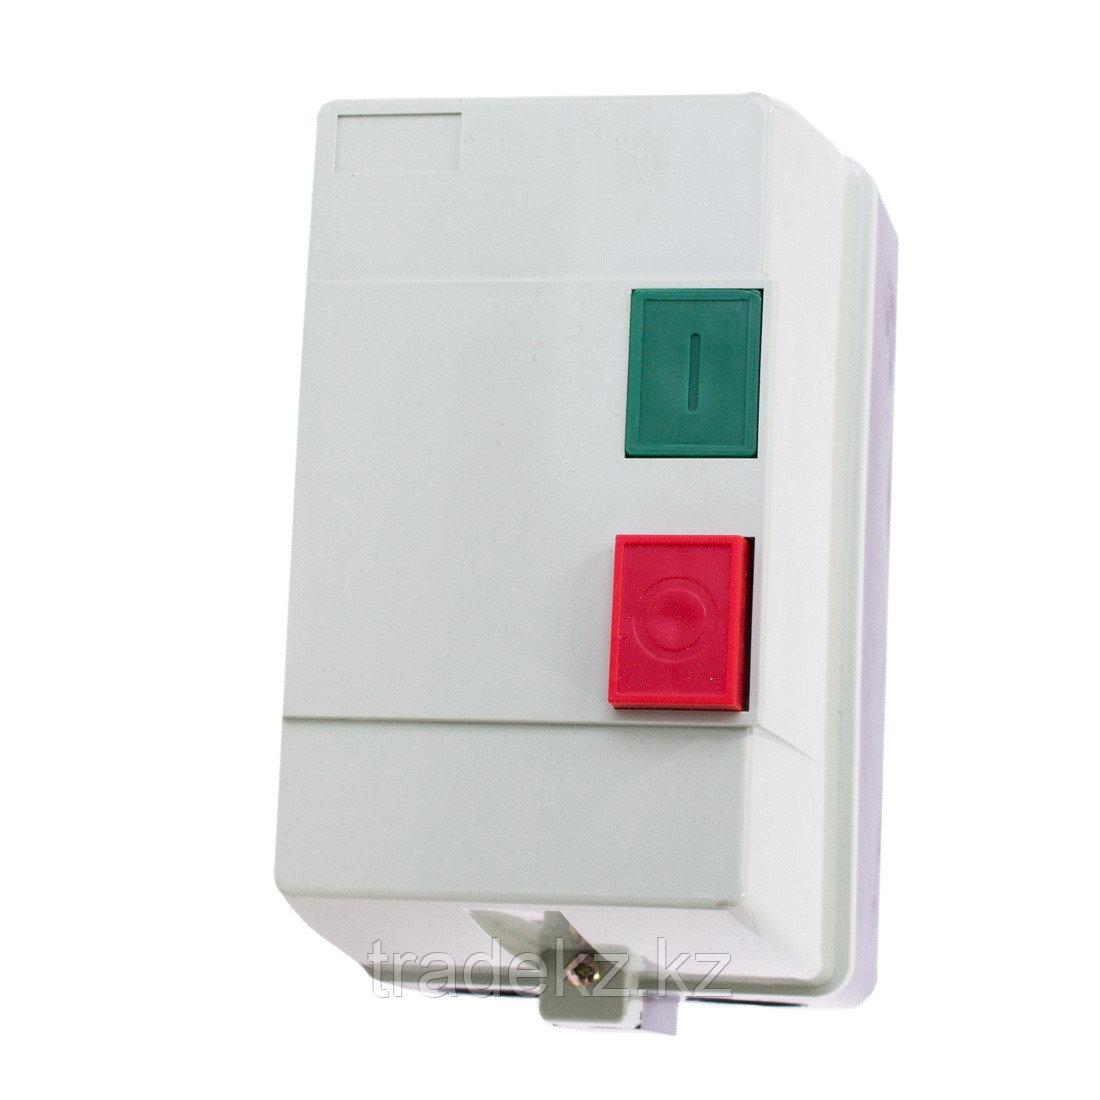 Контактор iPower КМИ-23260 32А АС 220В